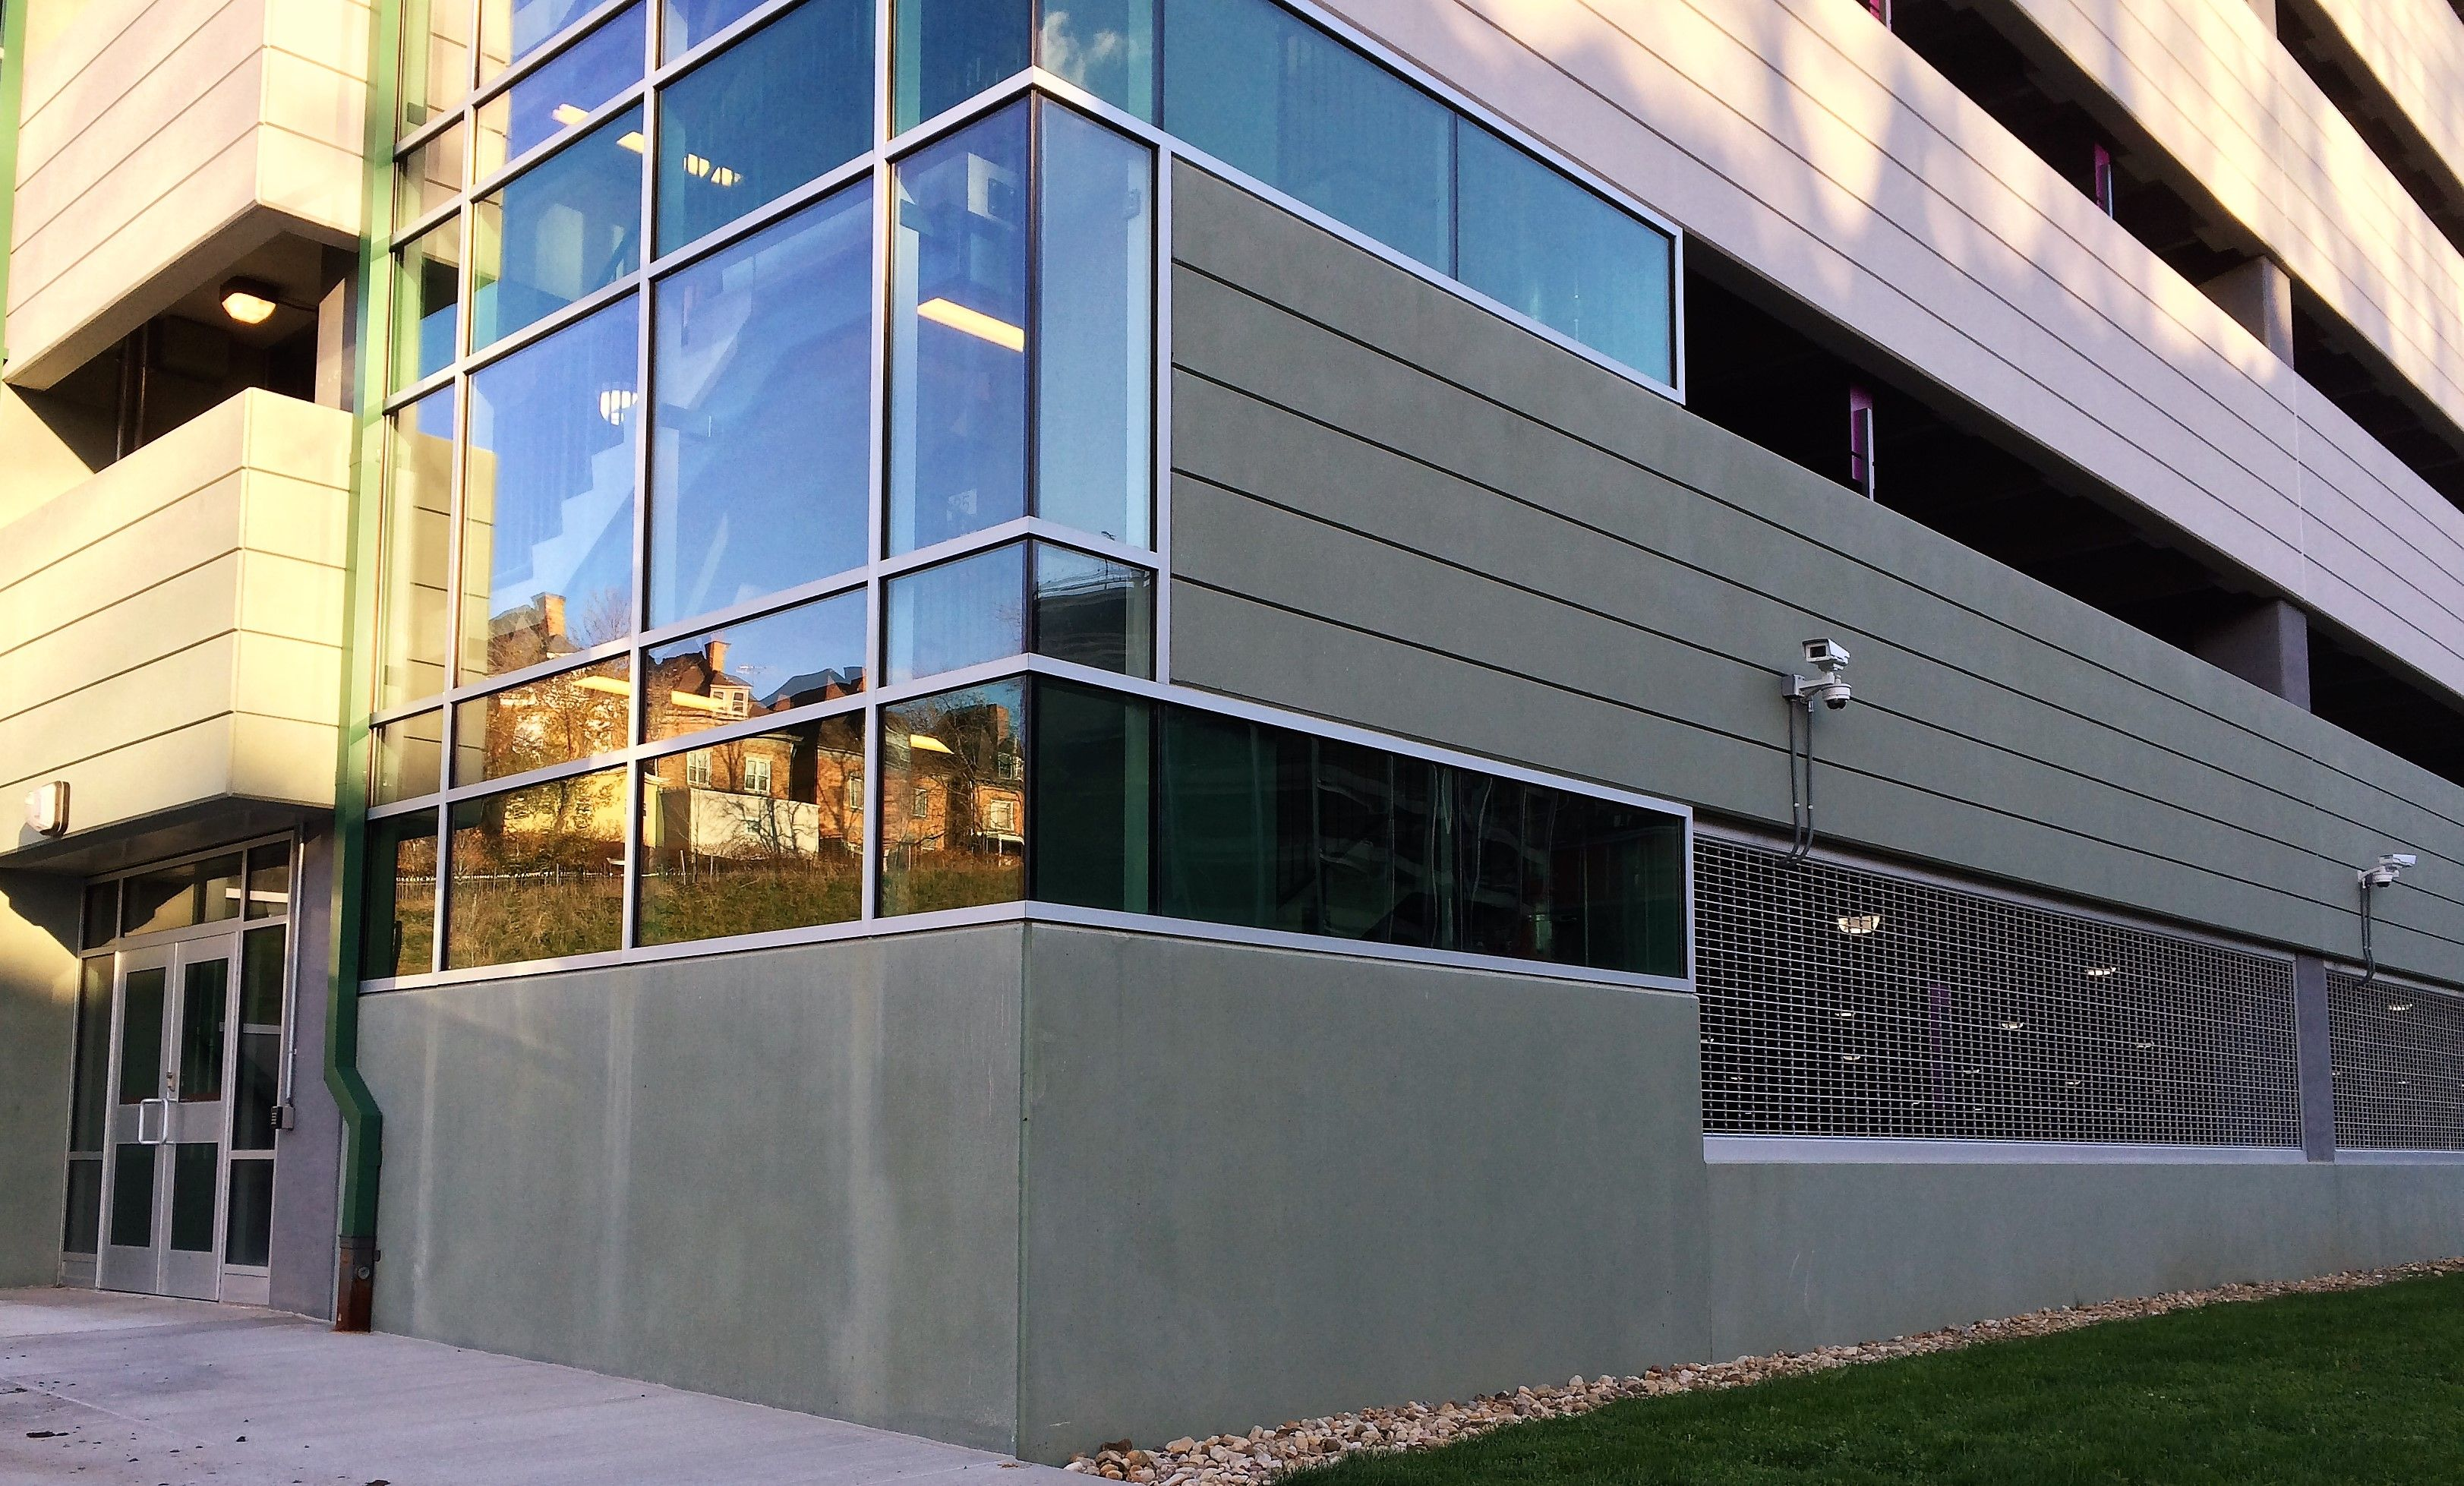 Luna Precast Parking Garage With Green Pigmented Concrete